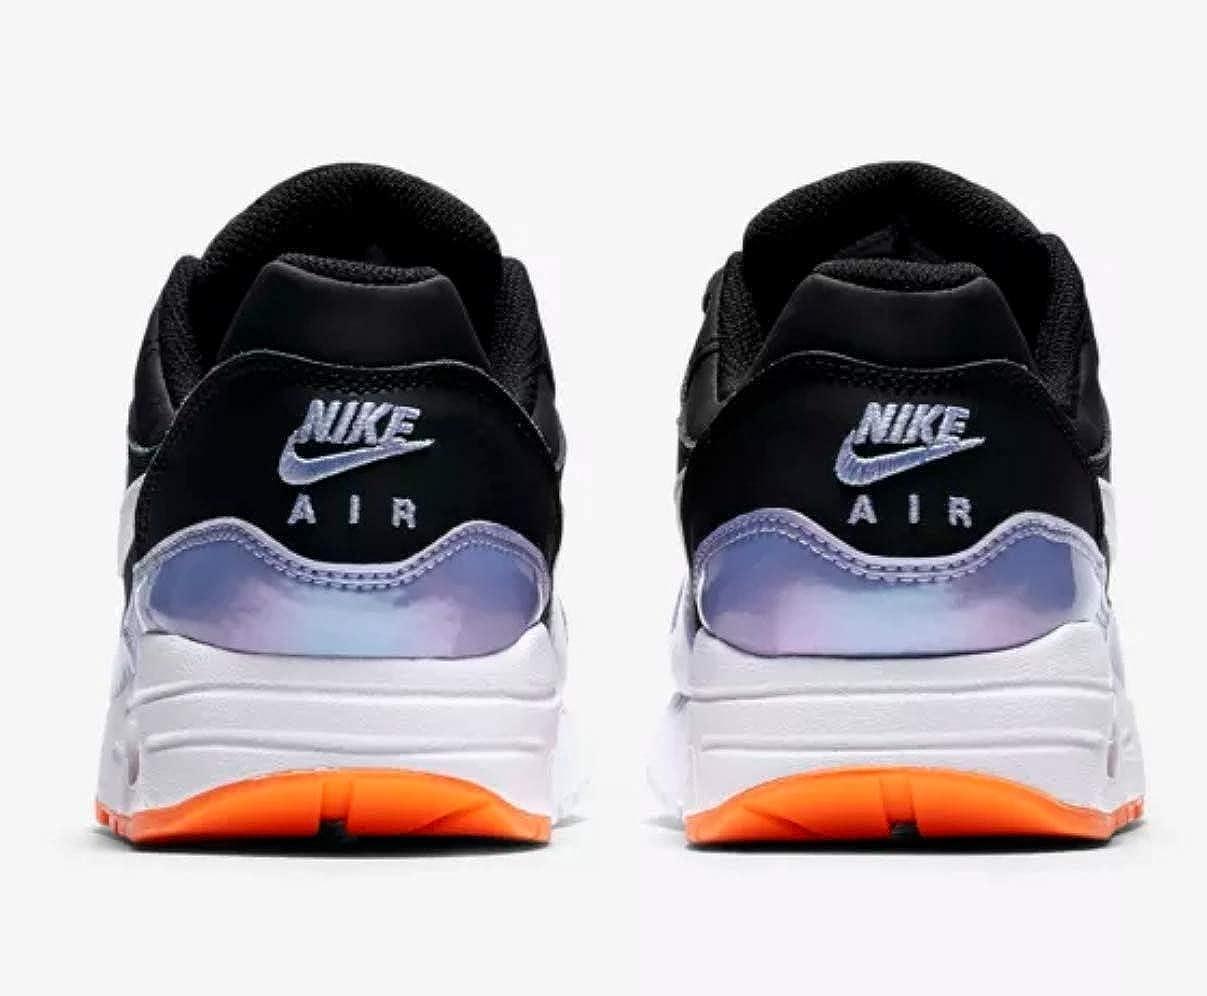 100% authentic e7c6f f0700 Amazon.com   Nike Air Max 1 (gs) Big Kids 807605-003   Running